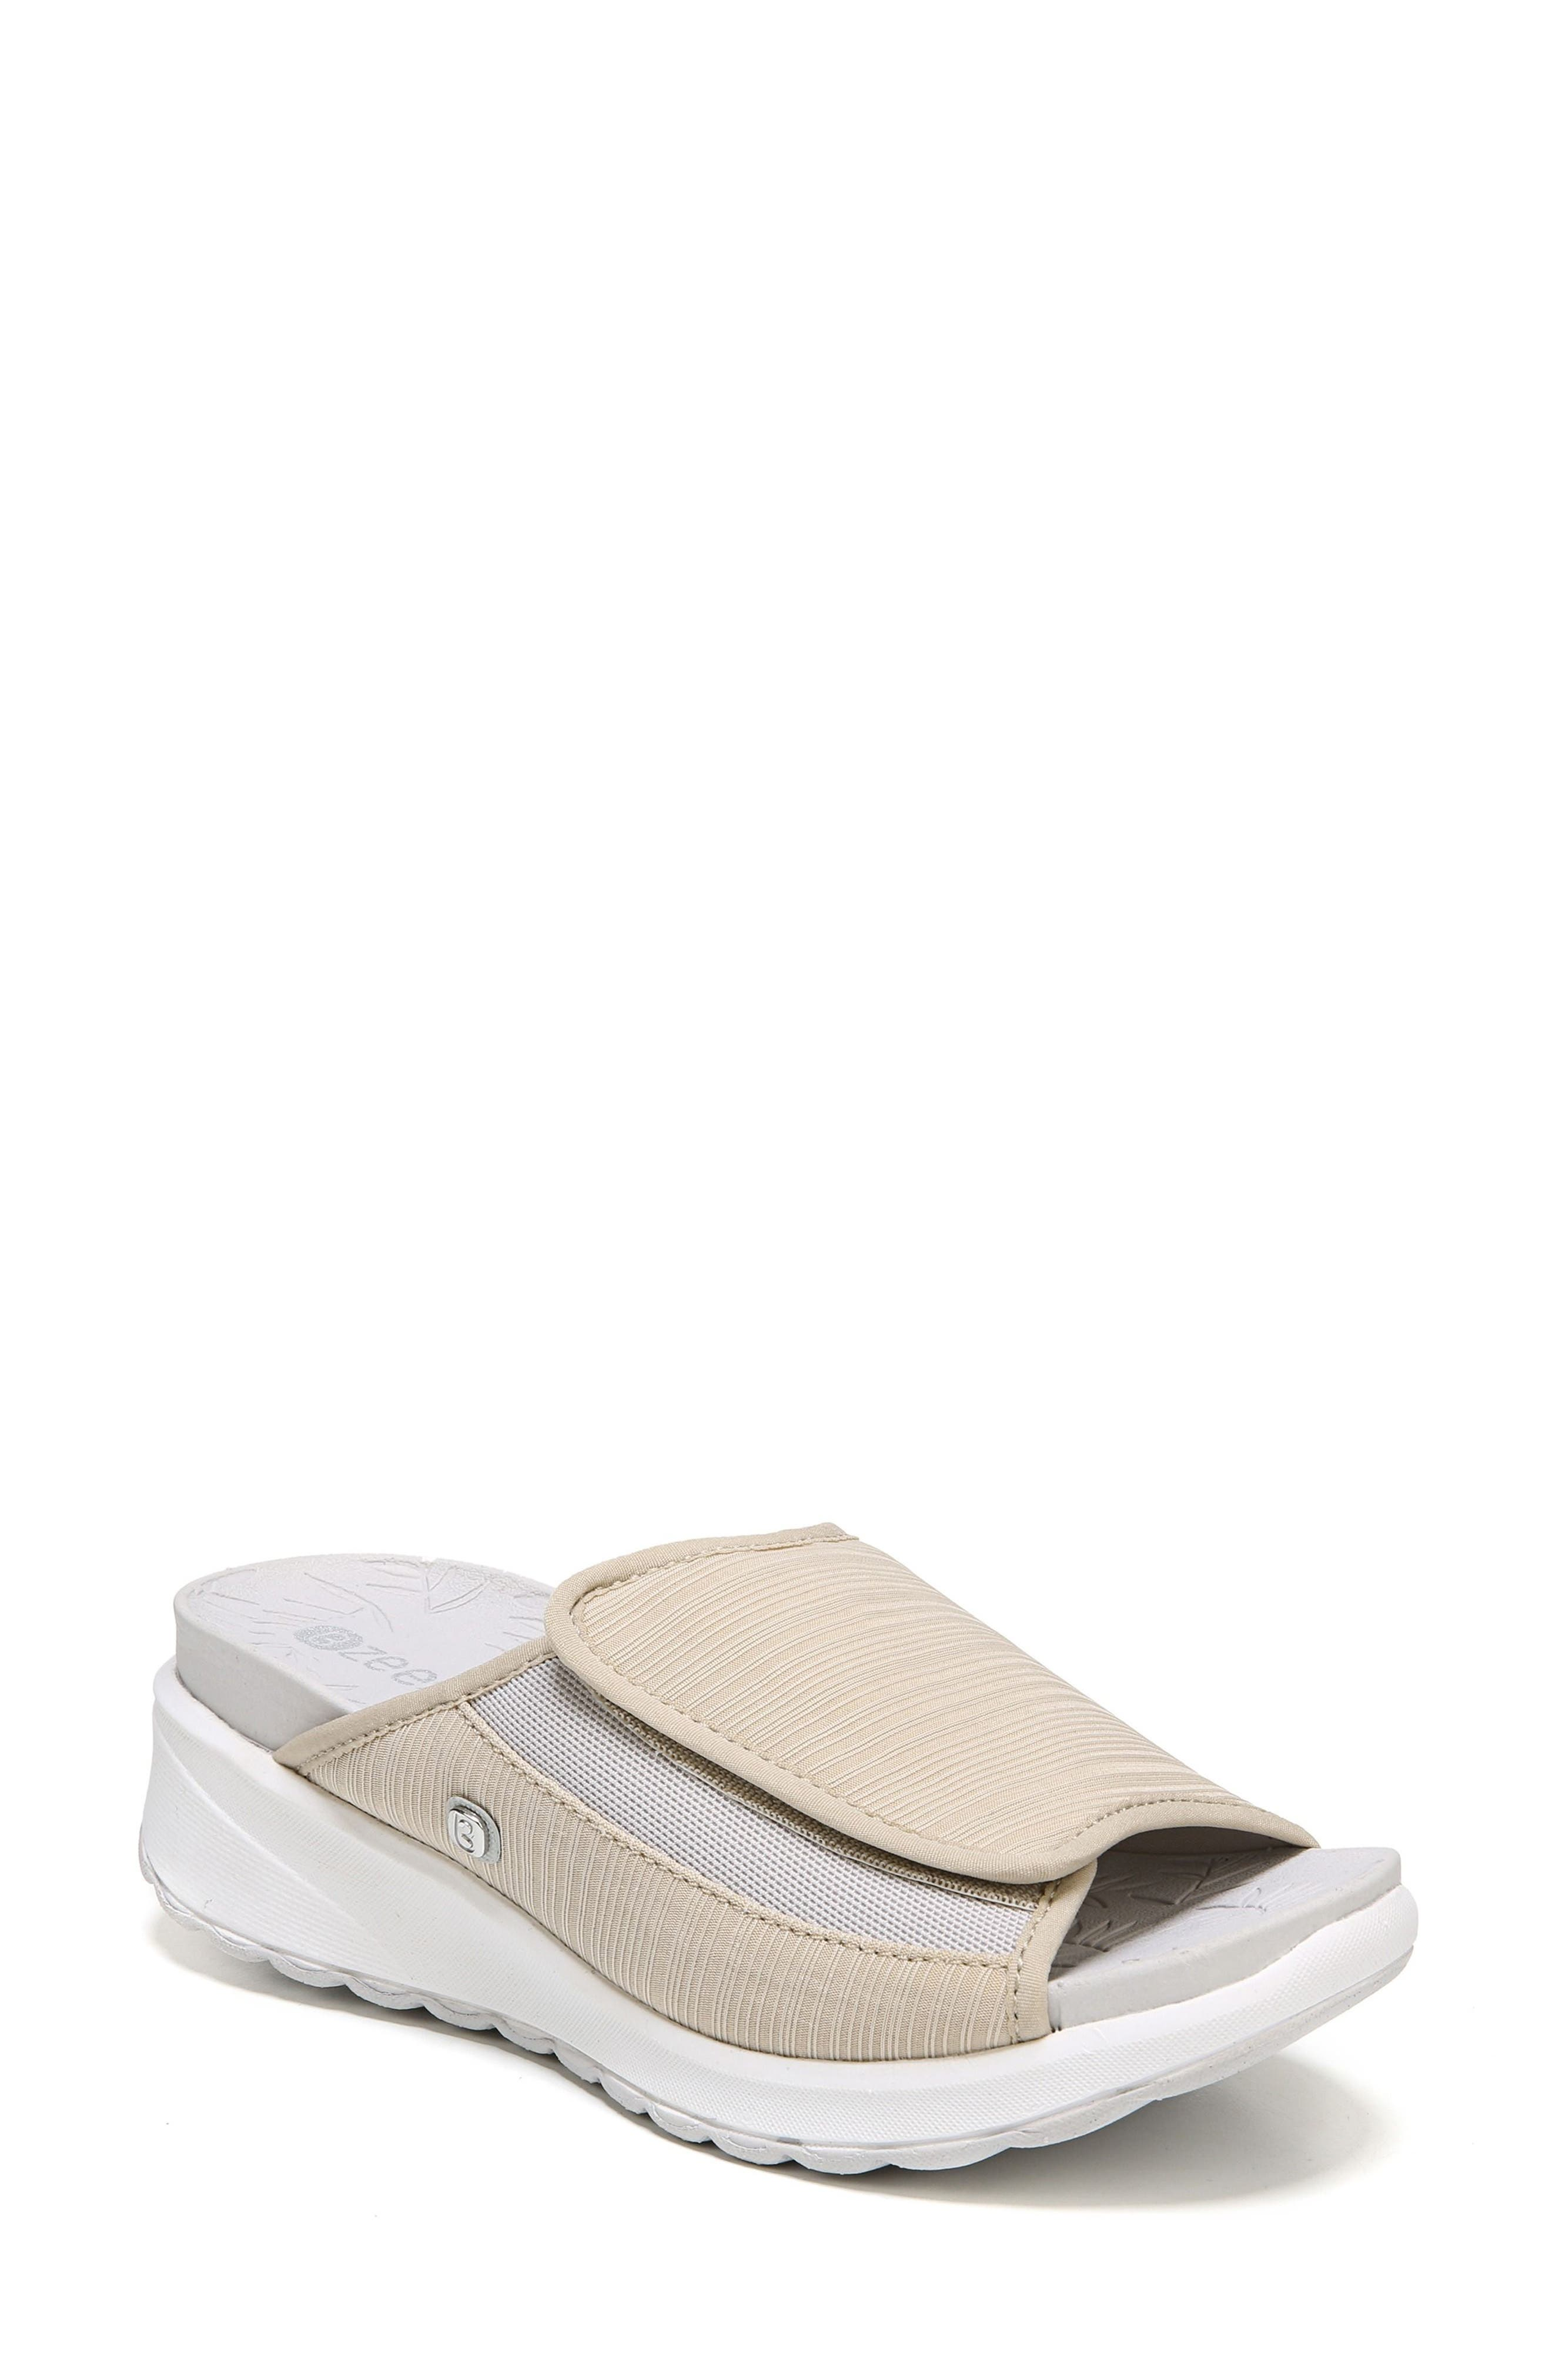 Bzees Galaxy Slide Sandal